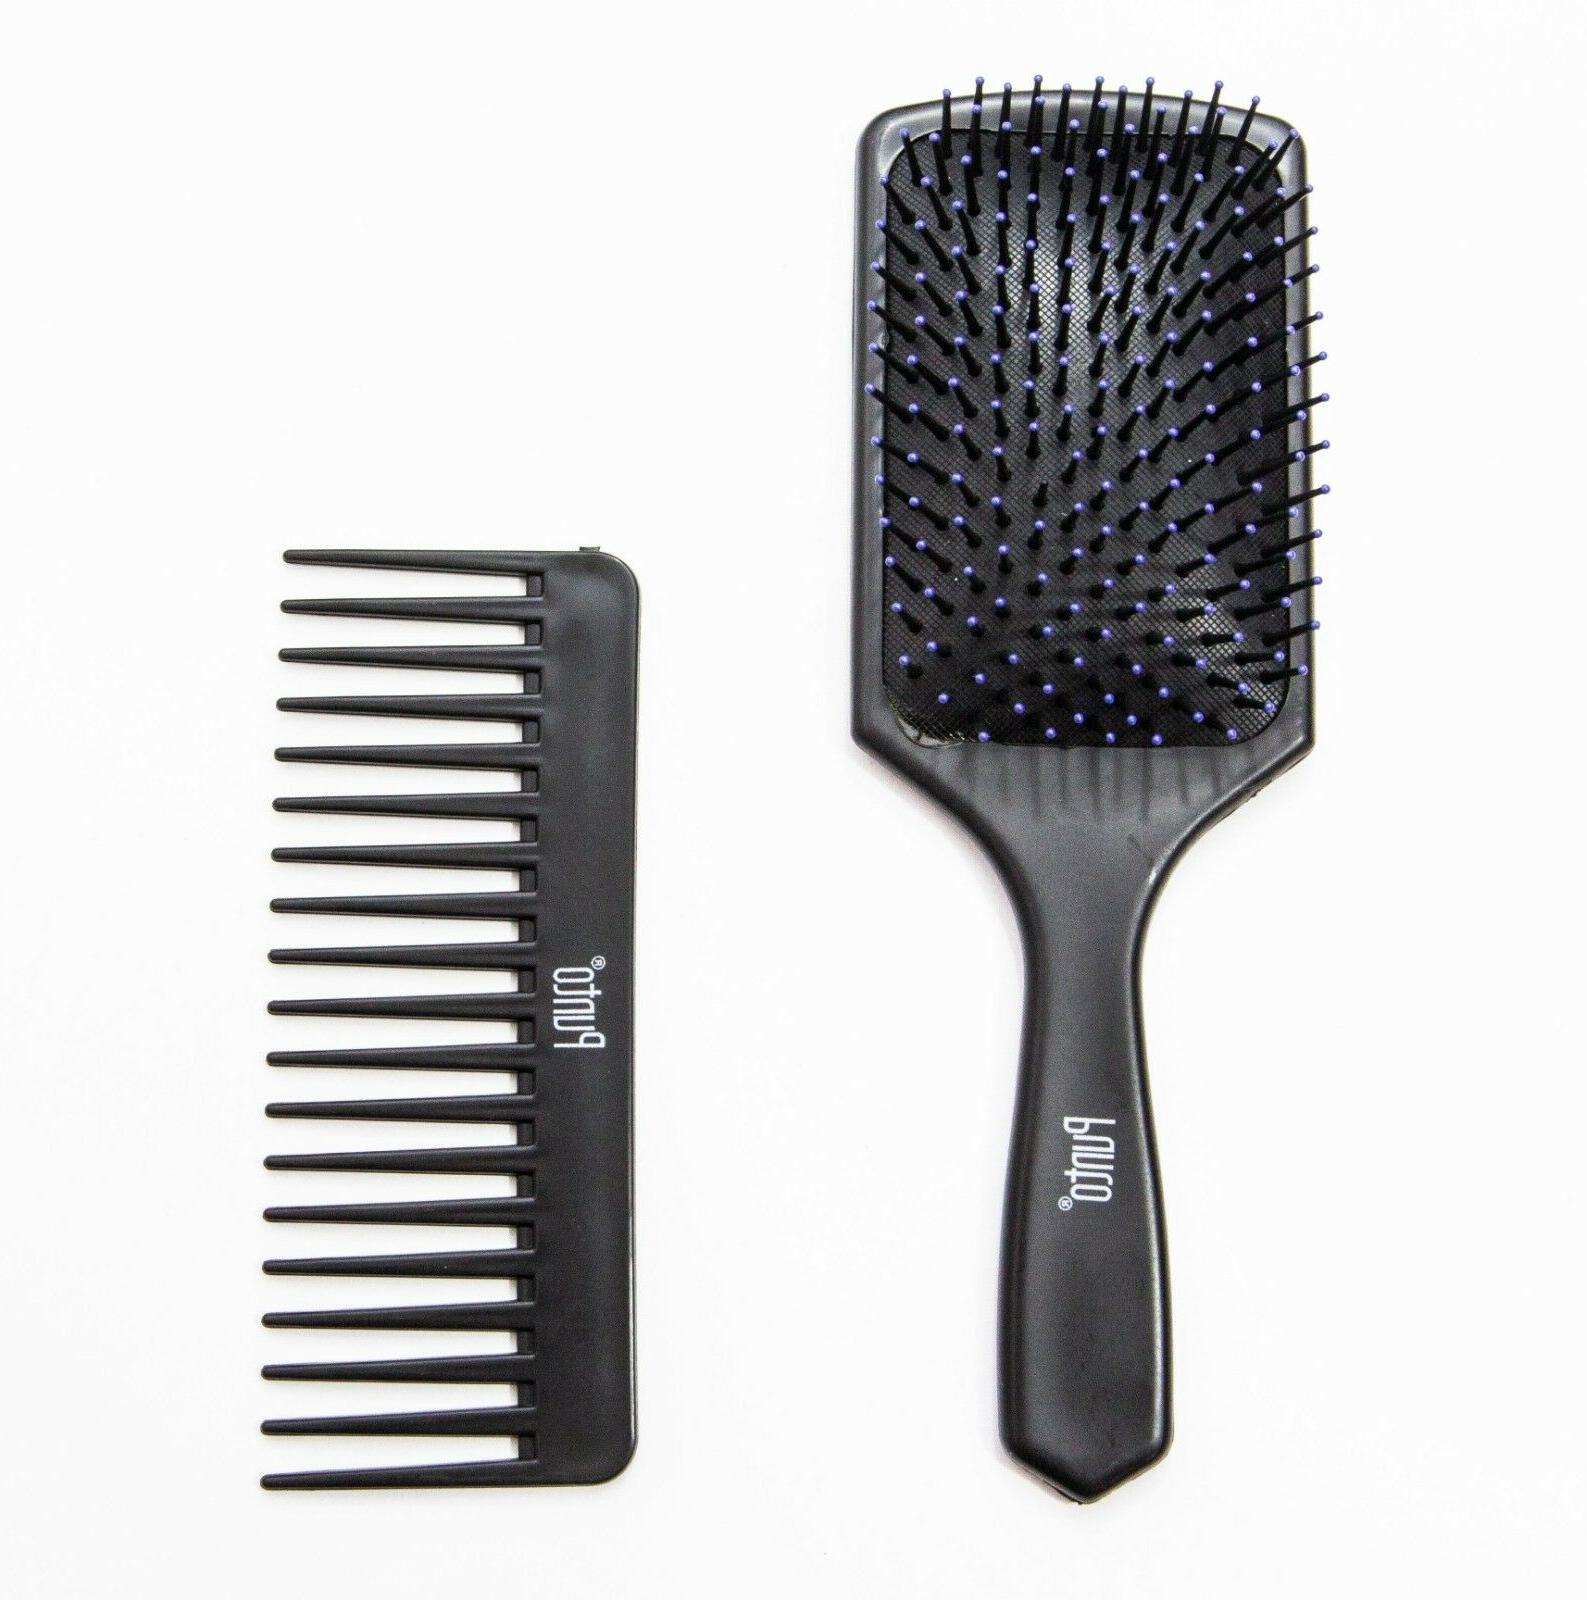 BRAND NEW PADDLE HAIR BRUSH WIDE COMB MASSAGE SCALP